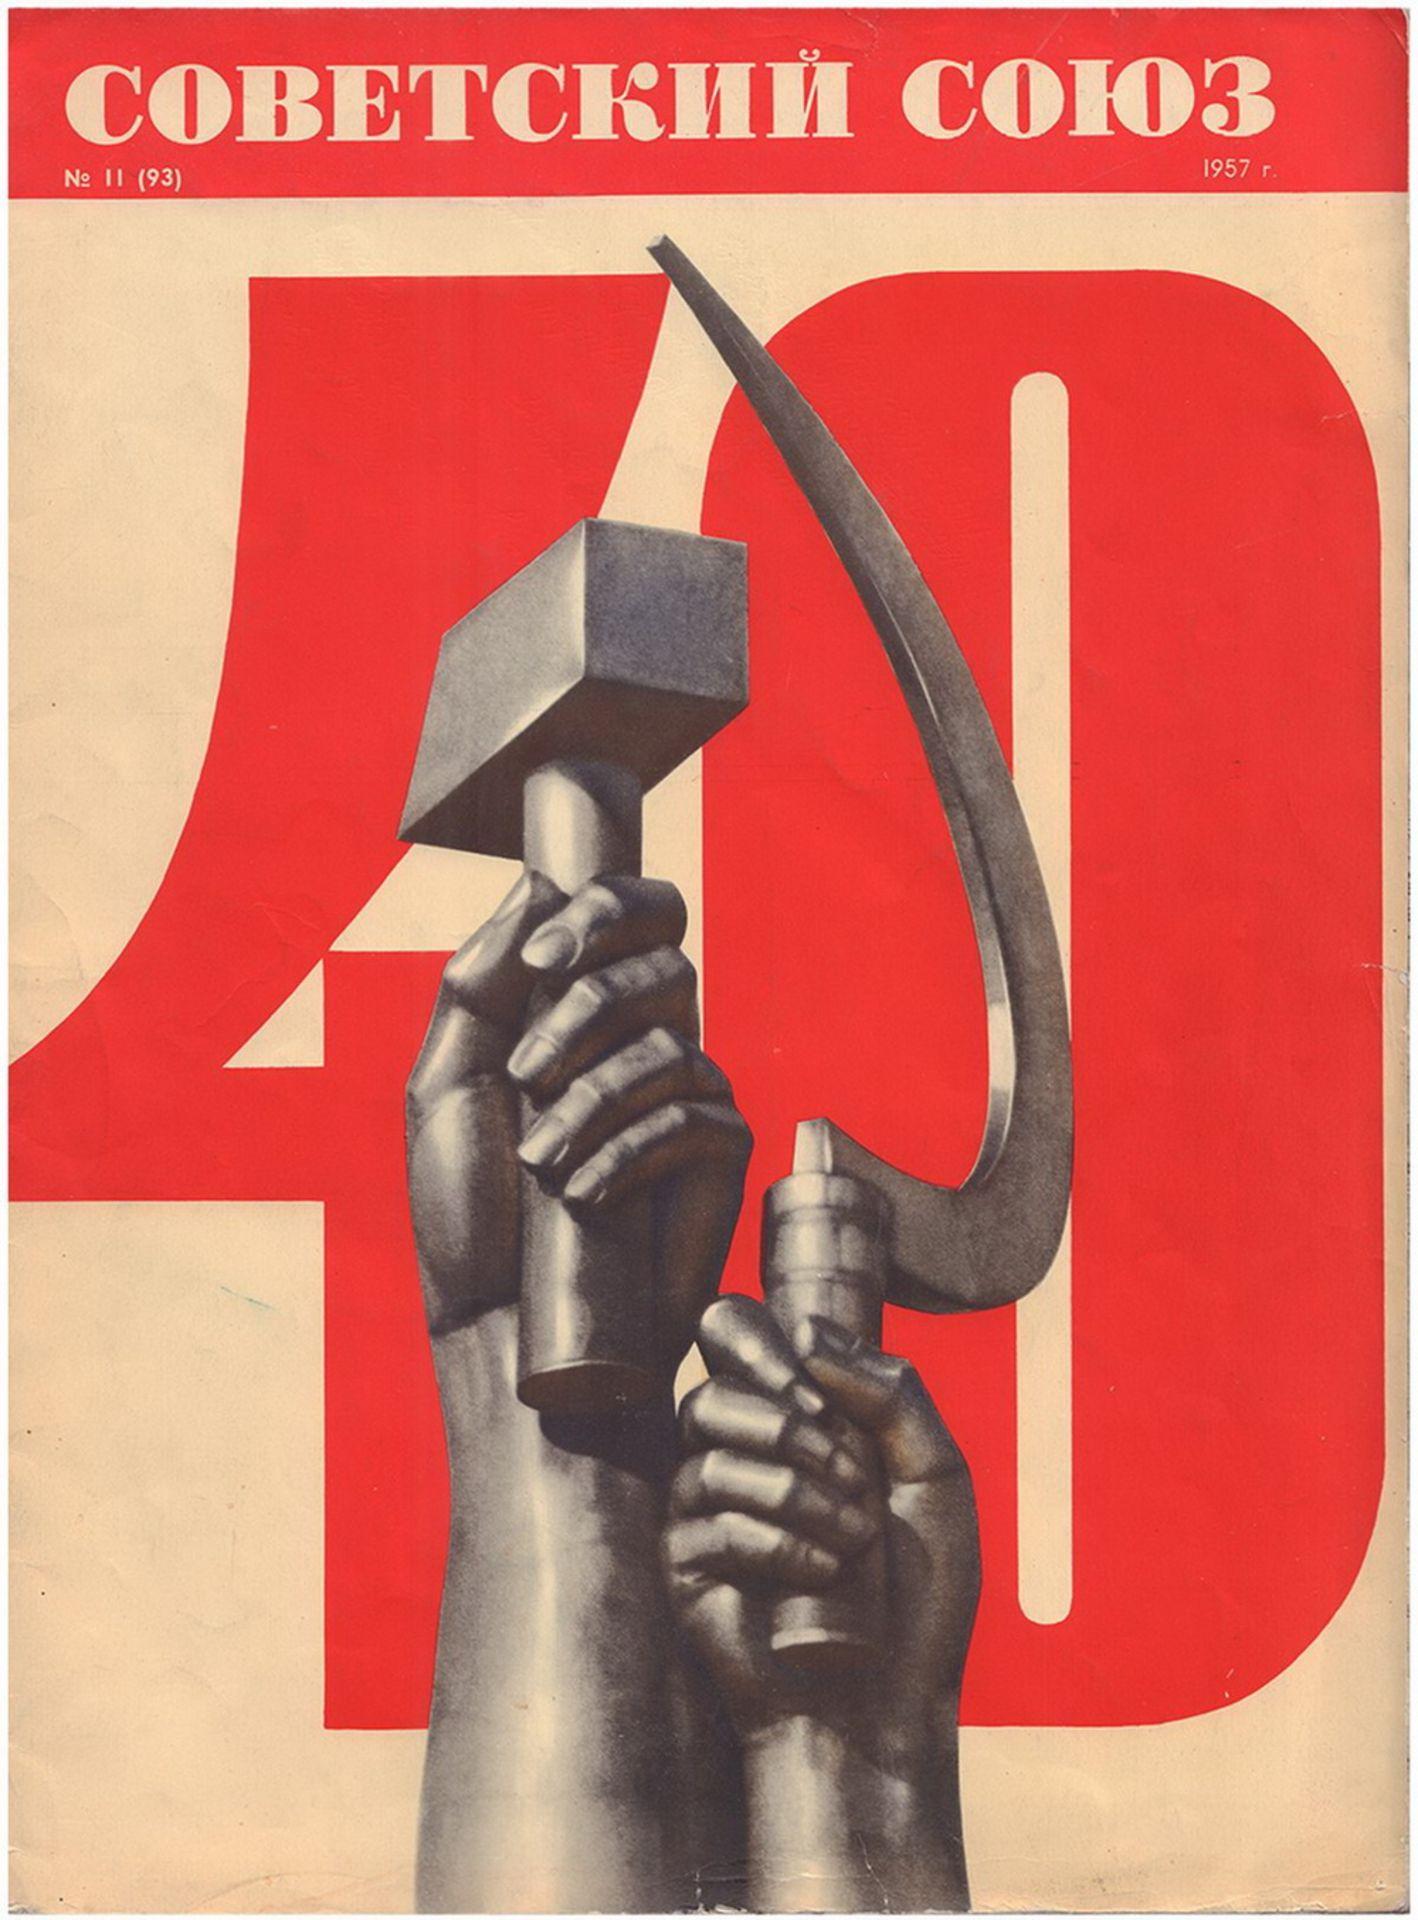 """Soviet Union"": Magazine. 11th (93) Anniversary Issue. Moscow, 1957. 40 pp.: ill.; 40x30 cm. <br>Ori"